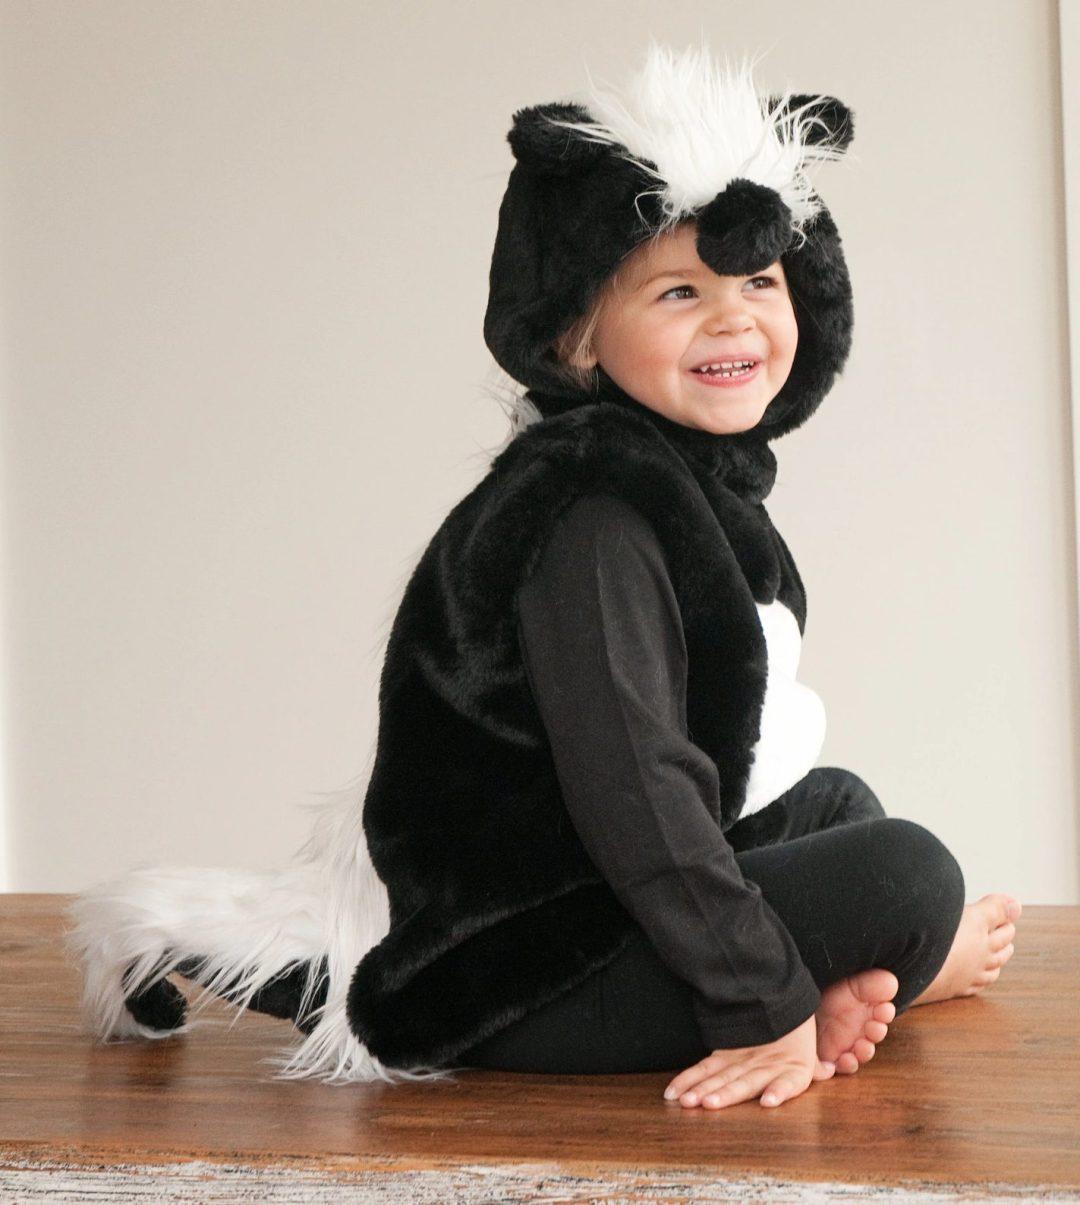 Skunk costume for kids